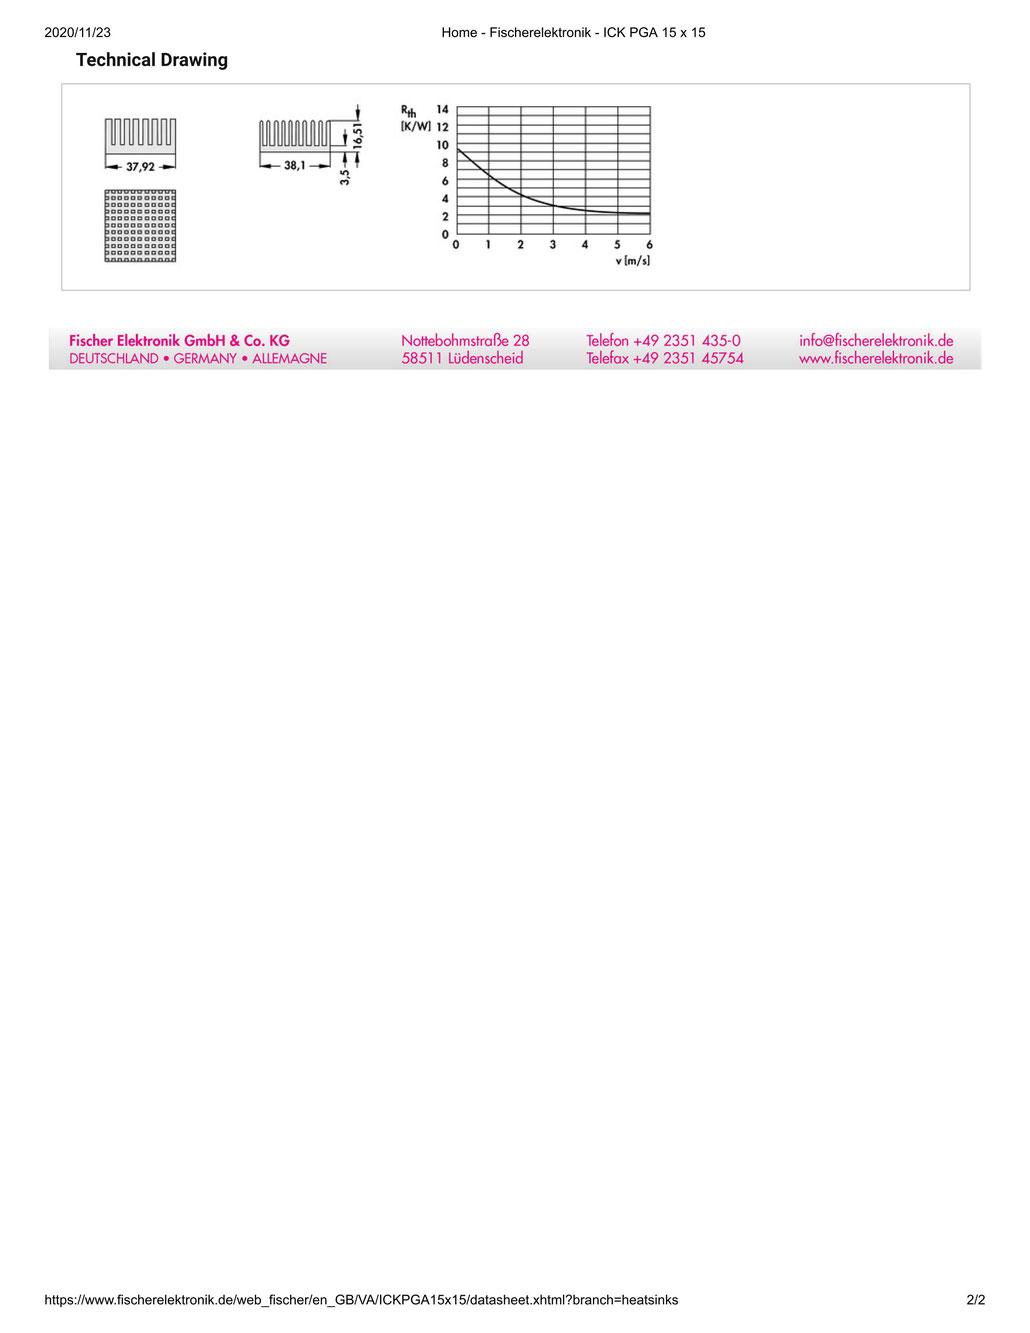 ICKPGA 15X15  Fischer /フィッシャー PGA用 ヒートシンク